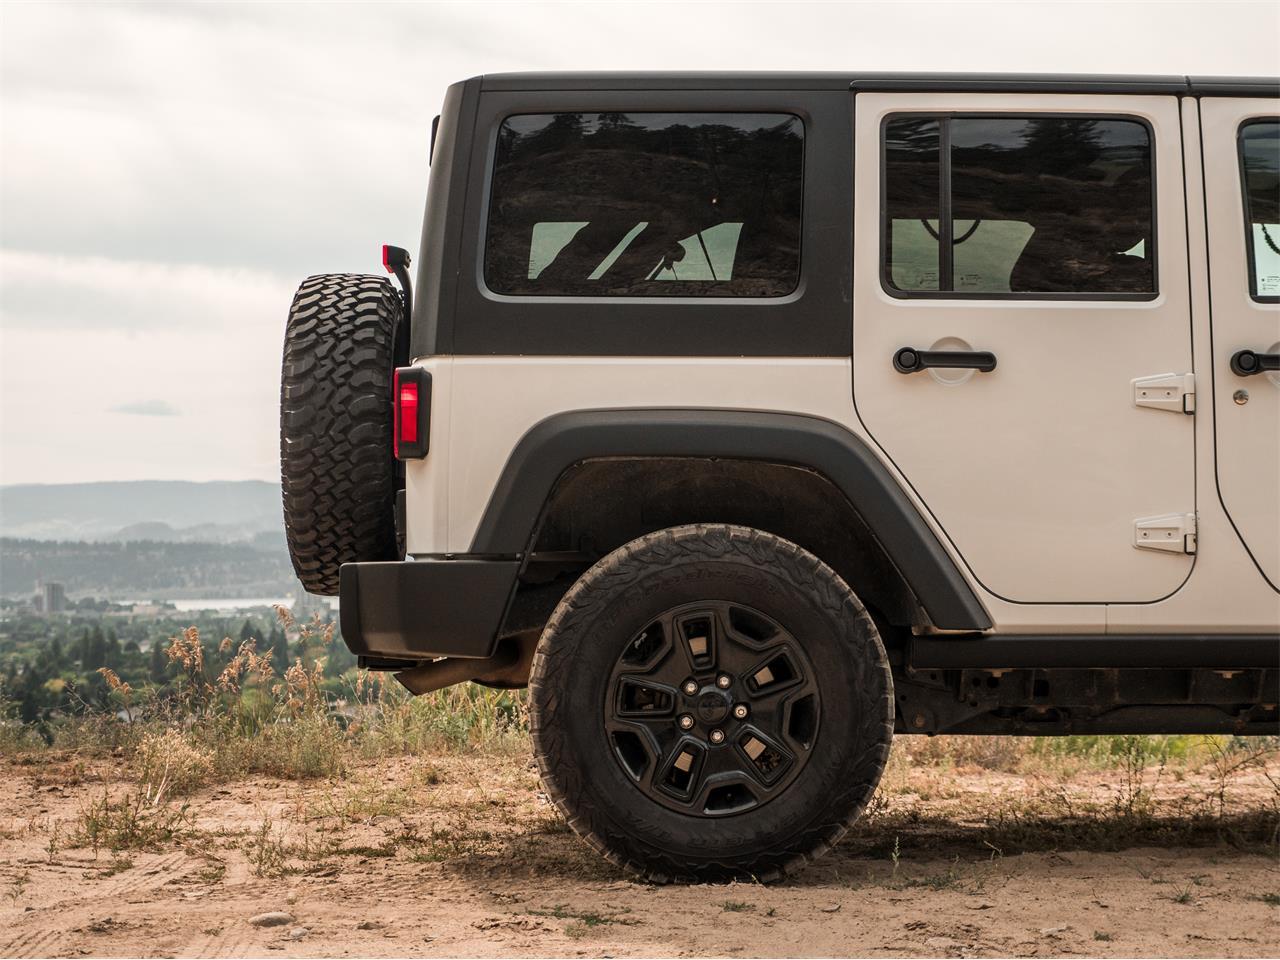 2016 Jeep Wrangler (CC-1247286) for sale in Kelowna, British Columbia